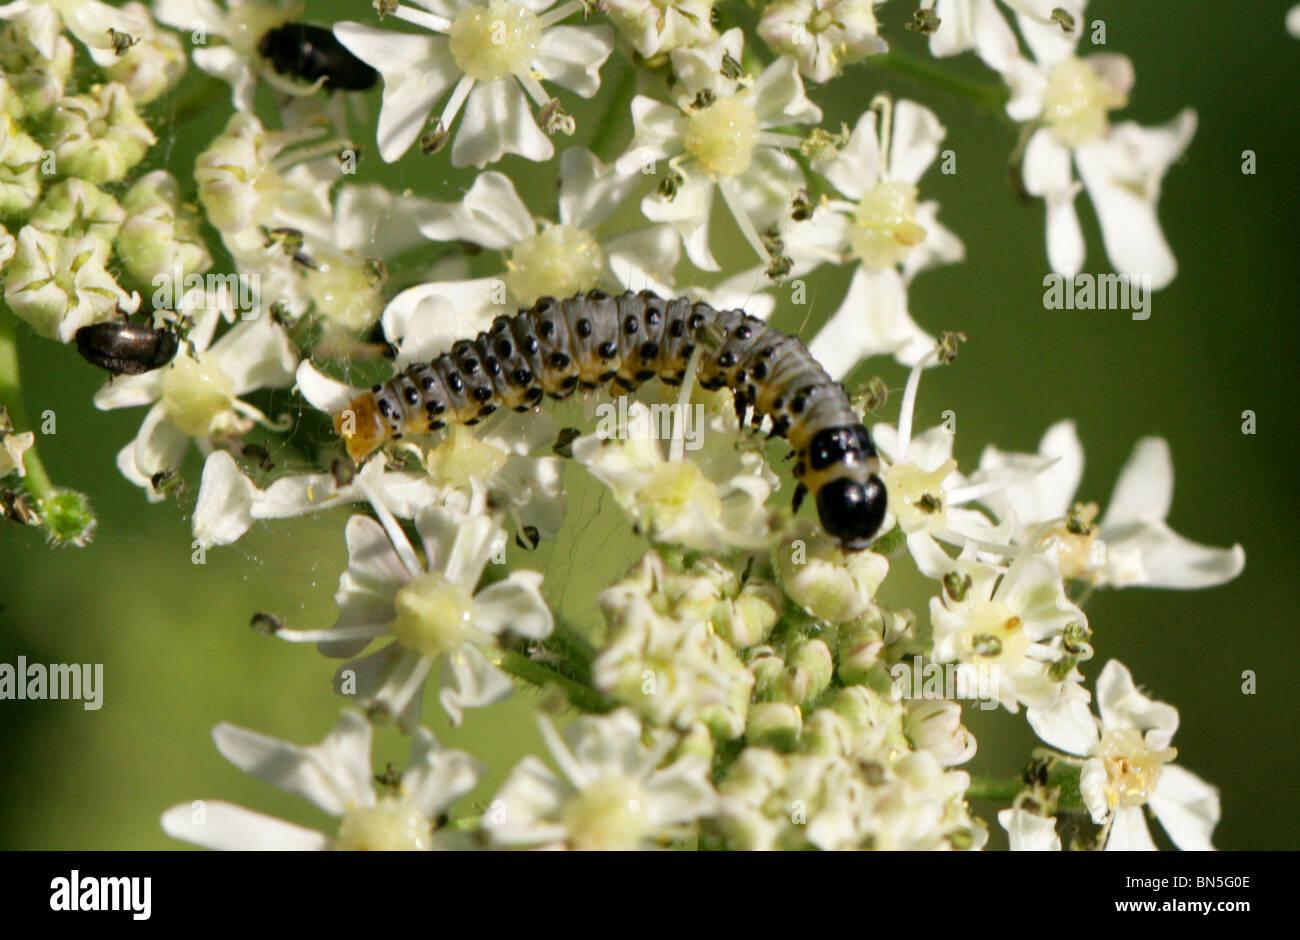 La alcachofa la alcachofa o Polilla Larva, Webworm Depressaria pastinacella, Depressariinae, Lepidoptera Oecophoridae, Imagen De Stock